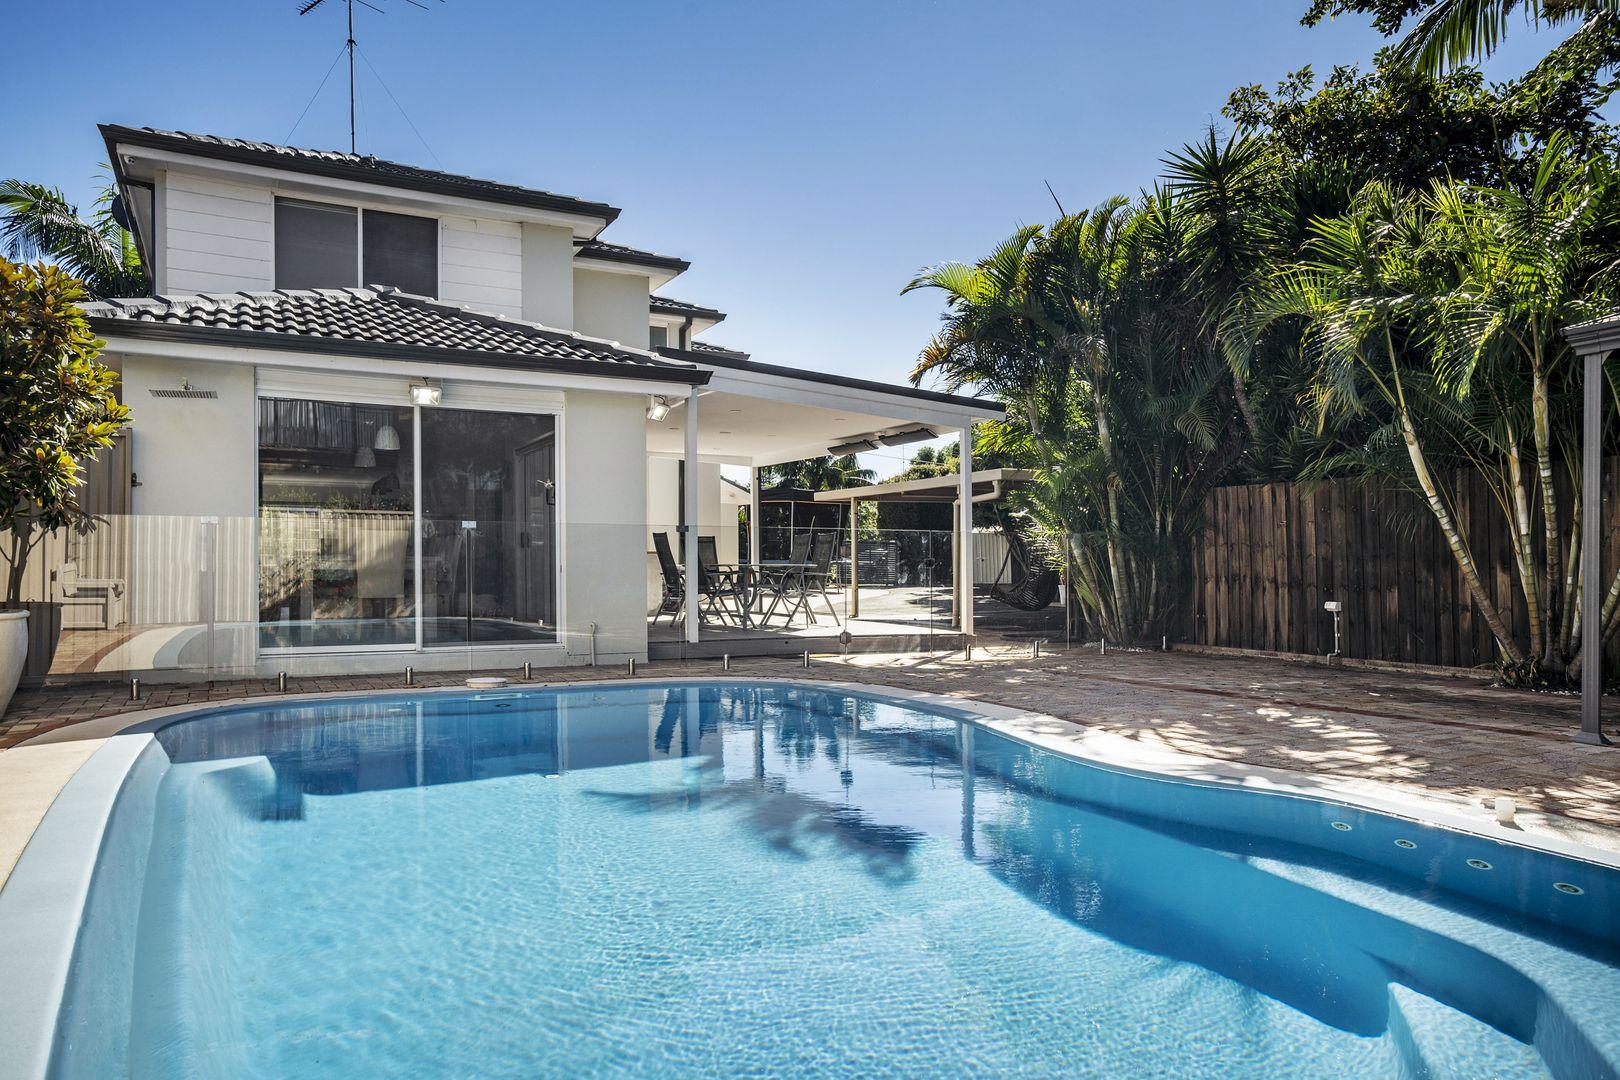 17 Storey Street, Maroubra NSW 2035, Image 0